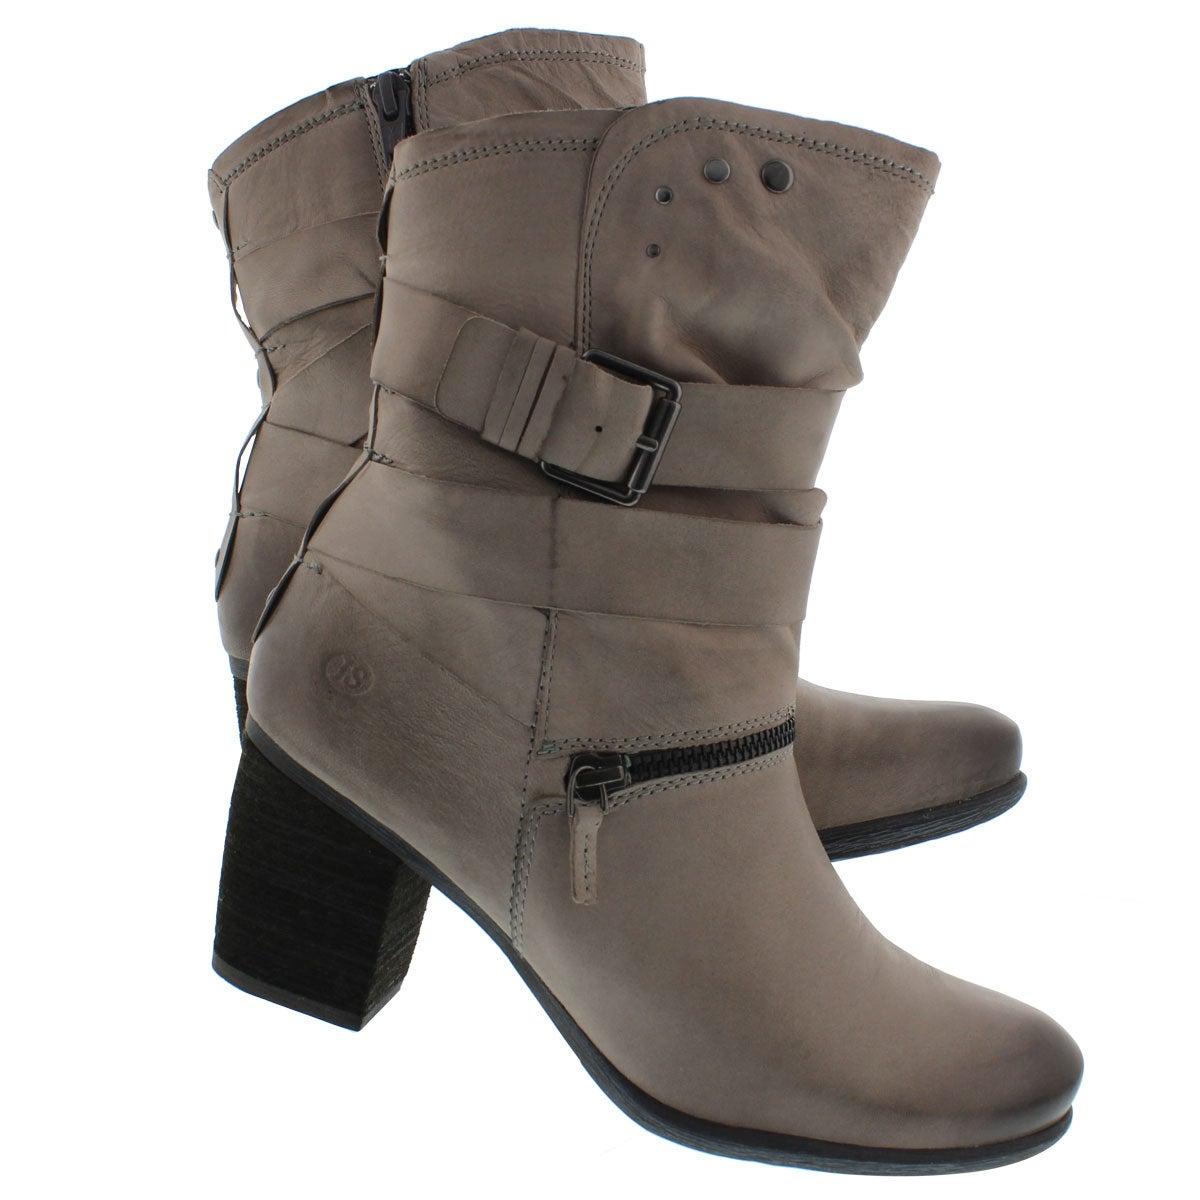 Lds Britney 06 grey lthr mid-calf boot